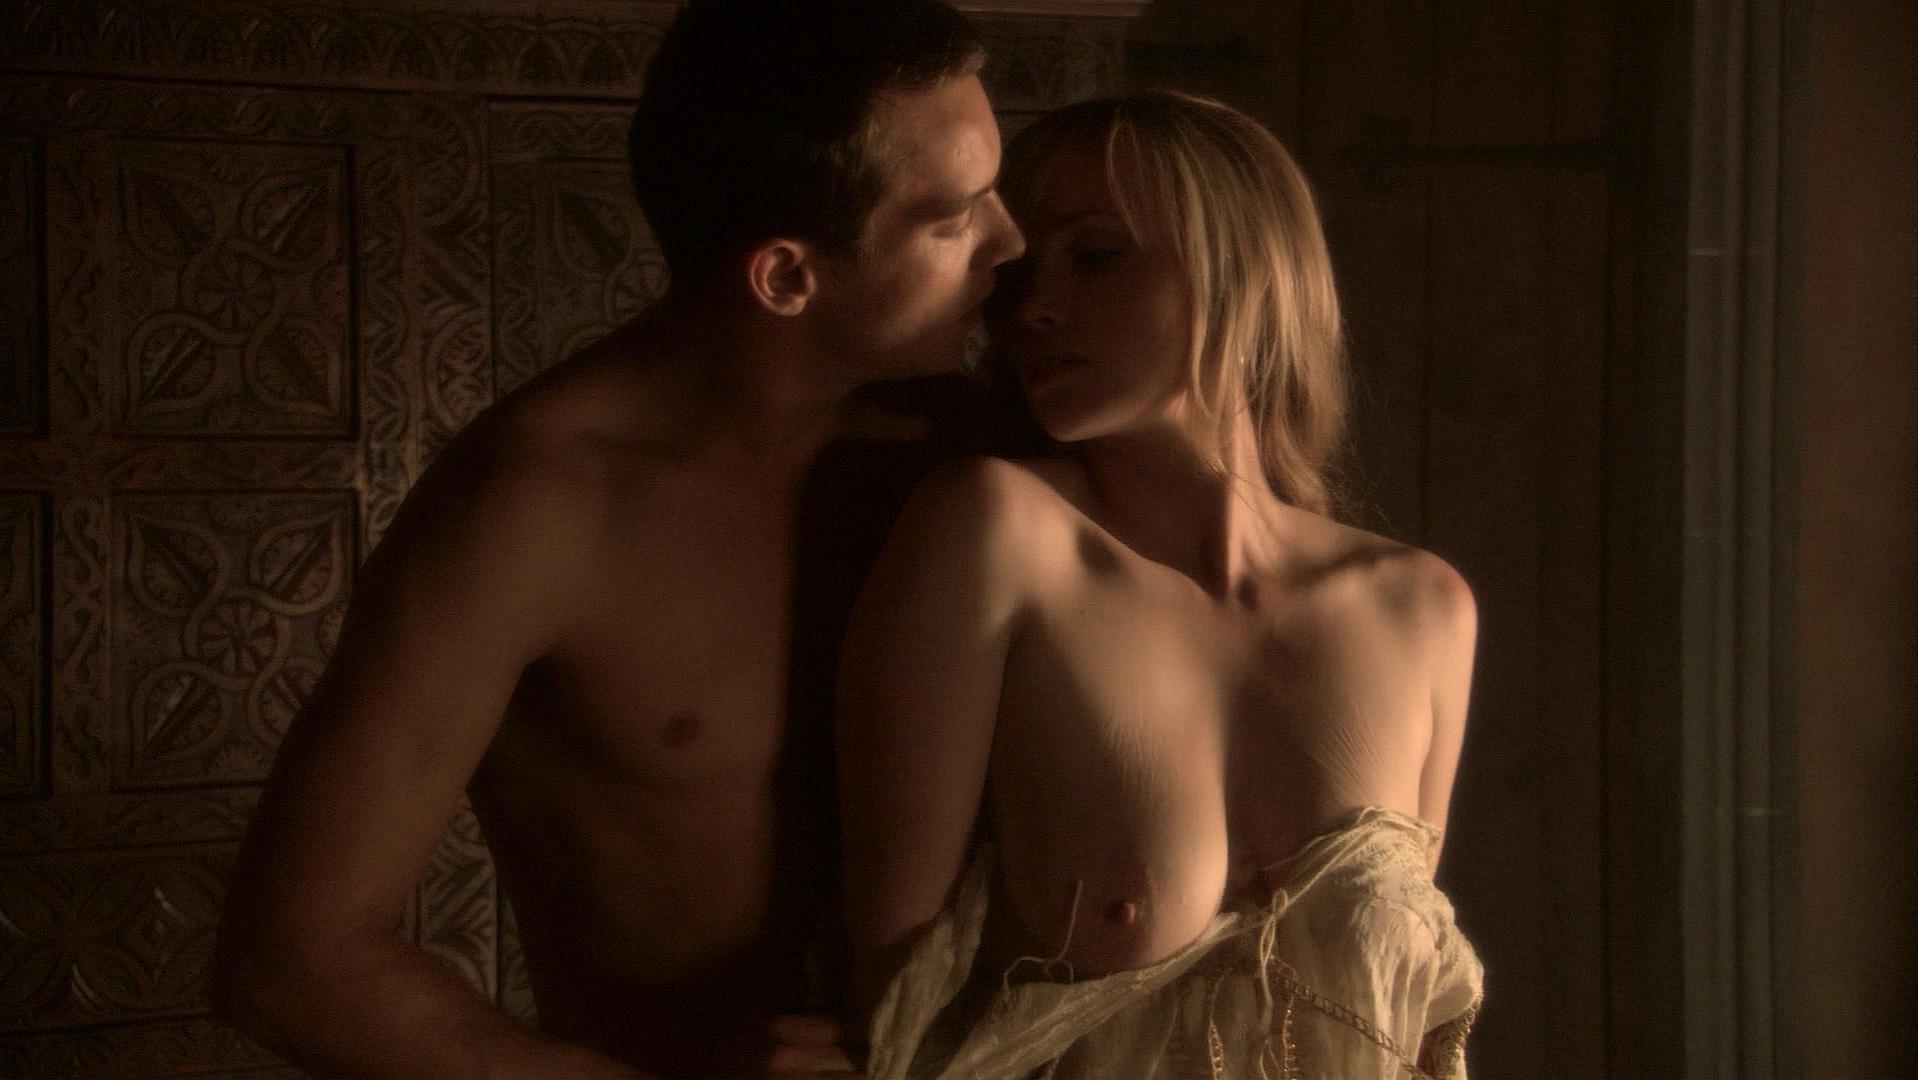 Ruta Gedmintas nude, Anna Brewster nude, Slaine Kelly nude - The Tudors s01e01 (2007)